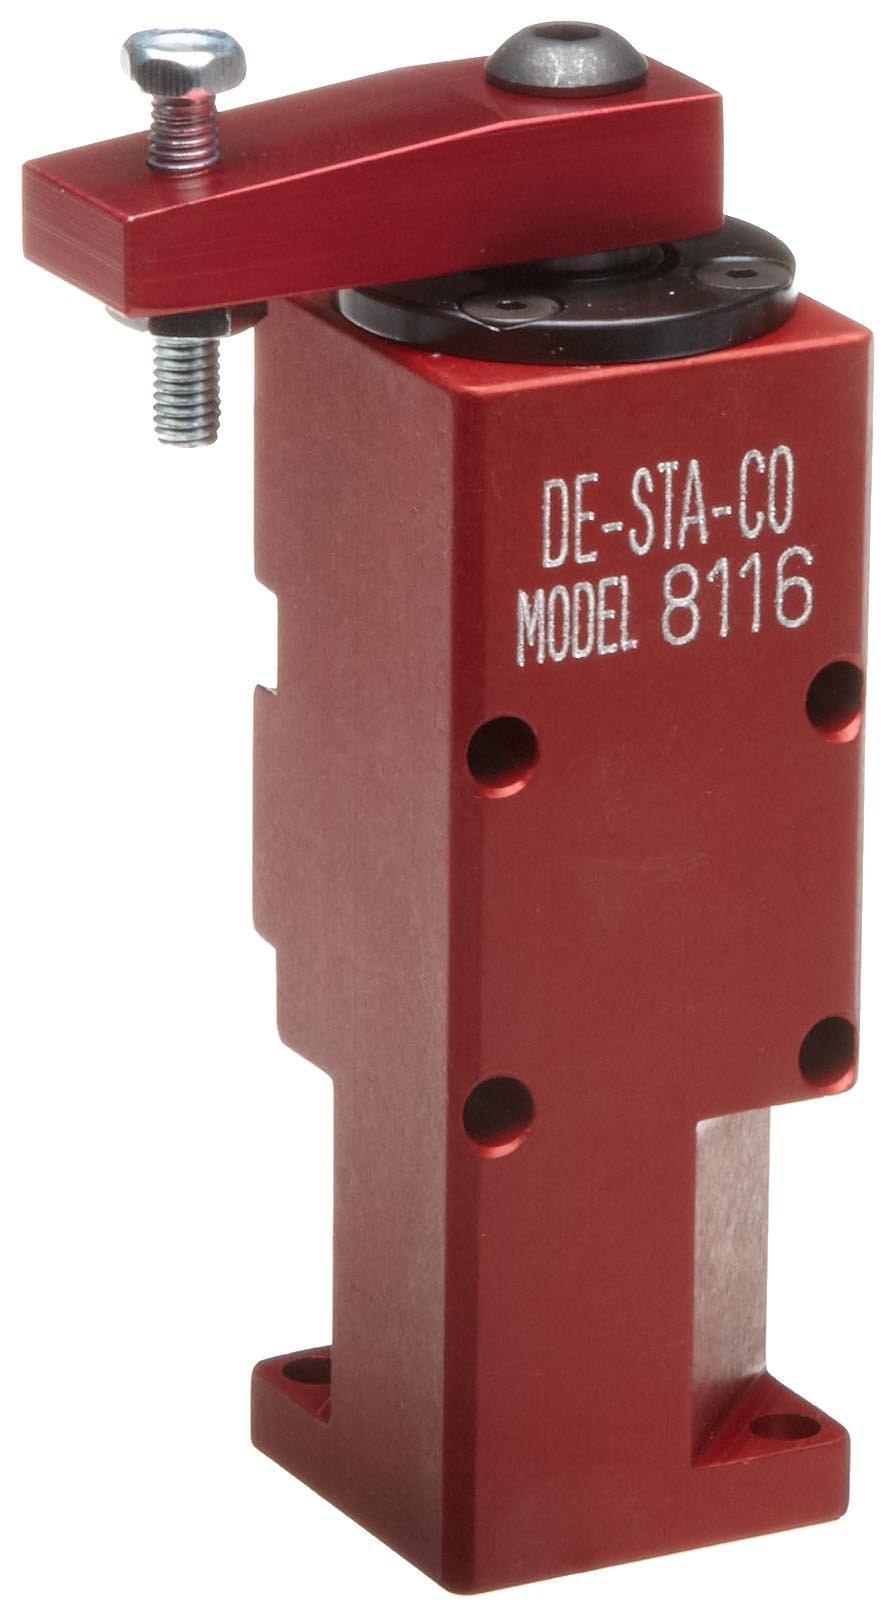 DE-STA-CO 8115 Pneumatic Swing Clamp by De-Sta-Co